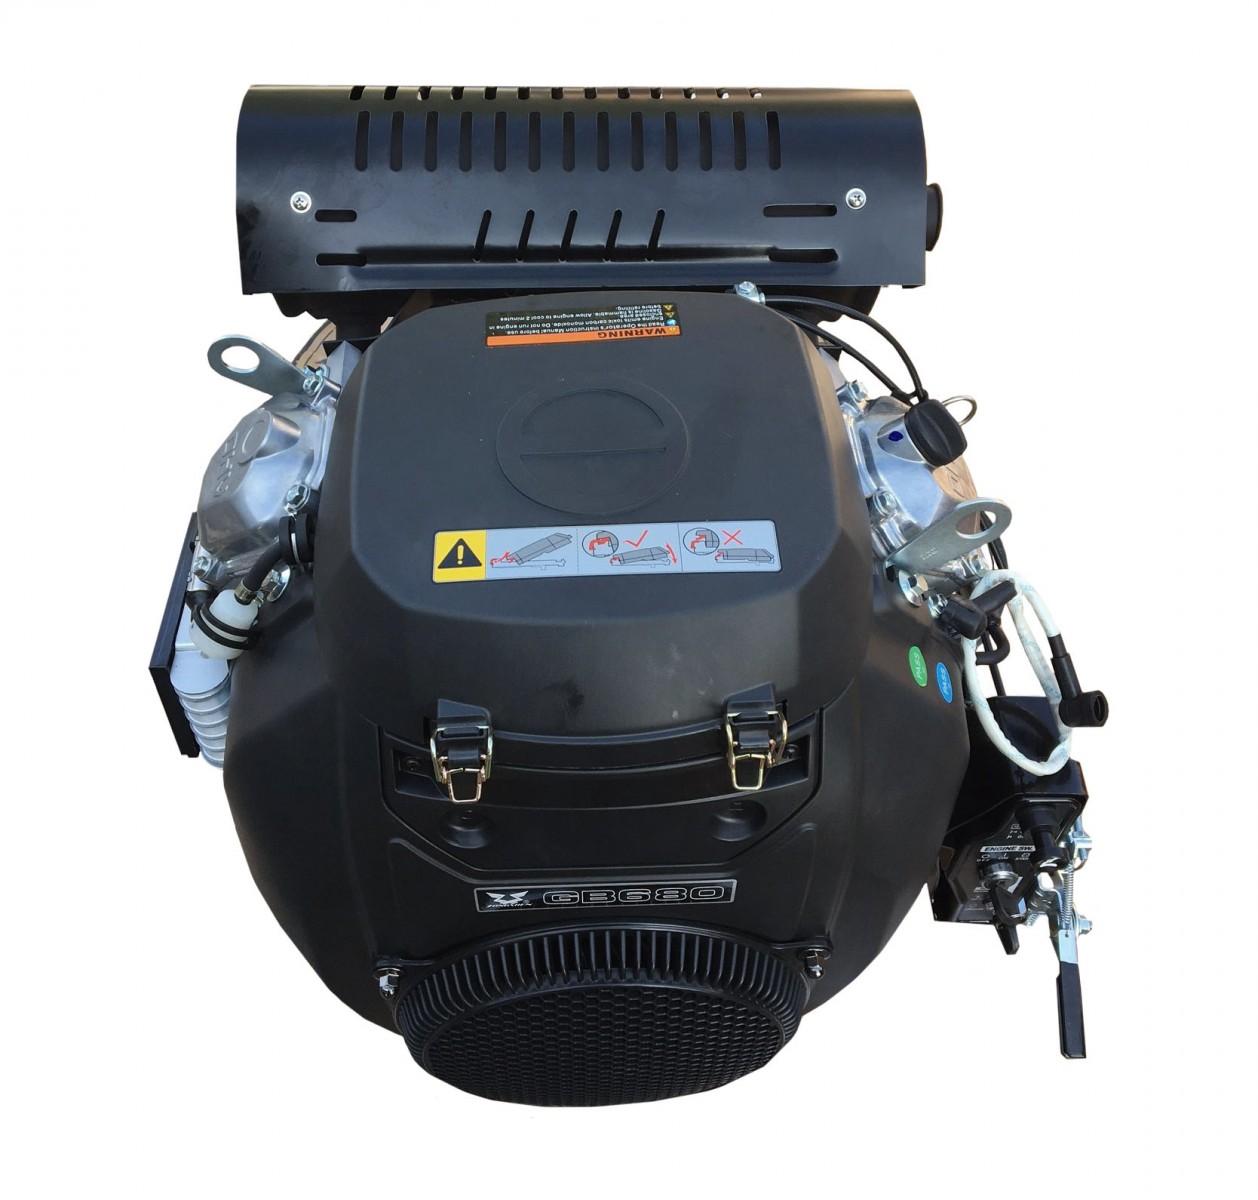 Motor ZONGSHEN GB680 680cc 22 TWIN horizontální hřídel 25.4mm